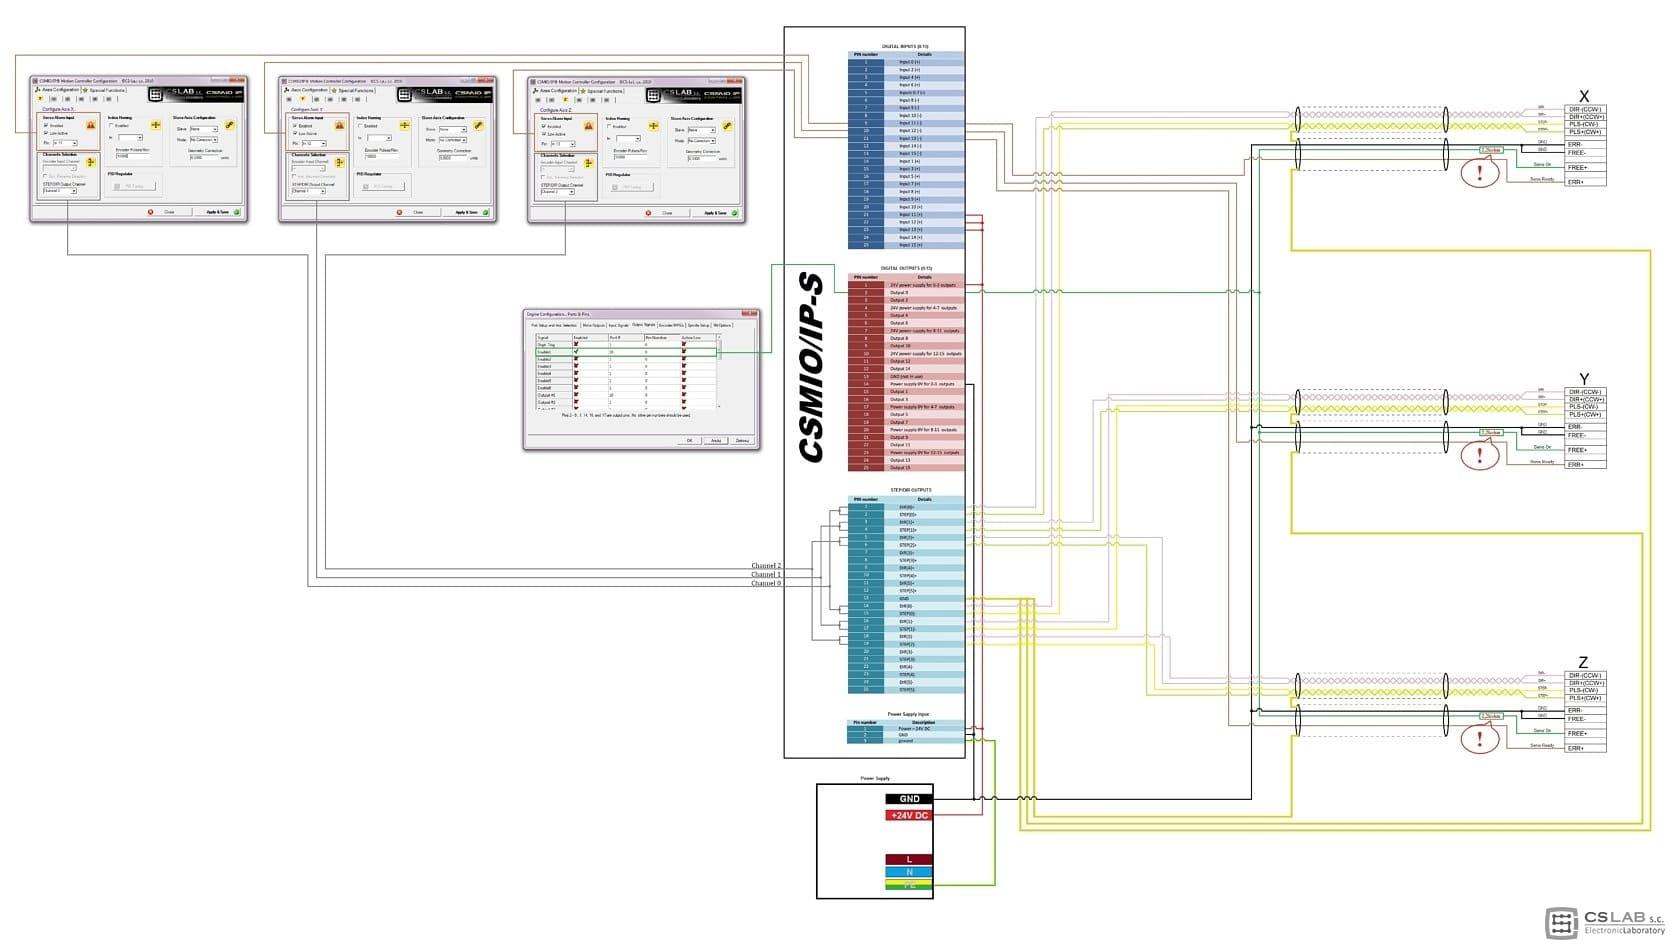 Aneta Author At Cs Lab Page 2 Of Yaskawa Vfd Wiring Diagrams Csmio Ip S Vs Kinco 2m2280n